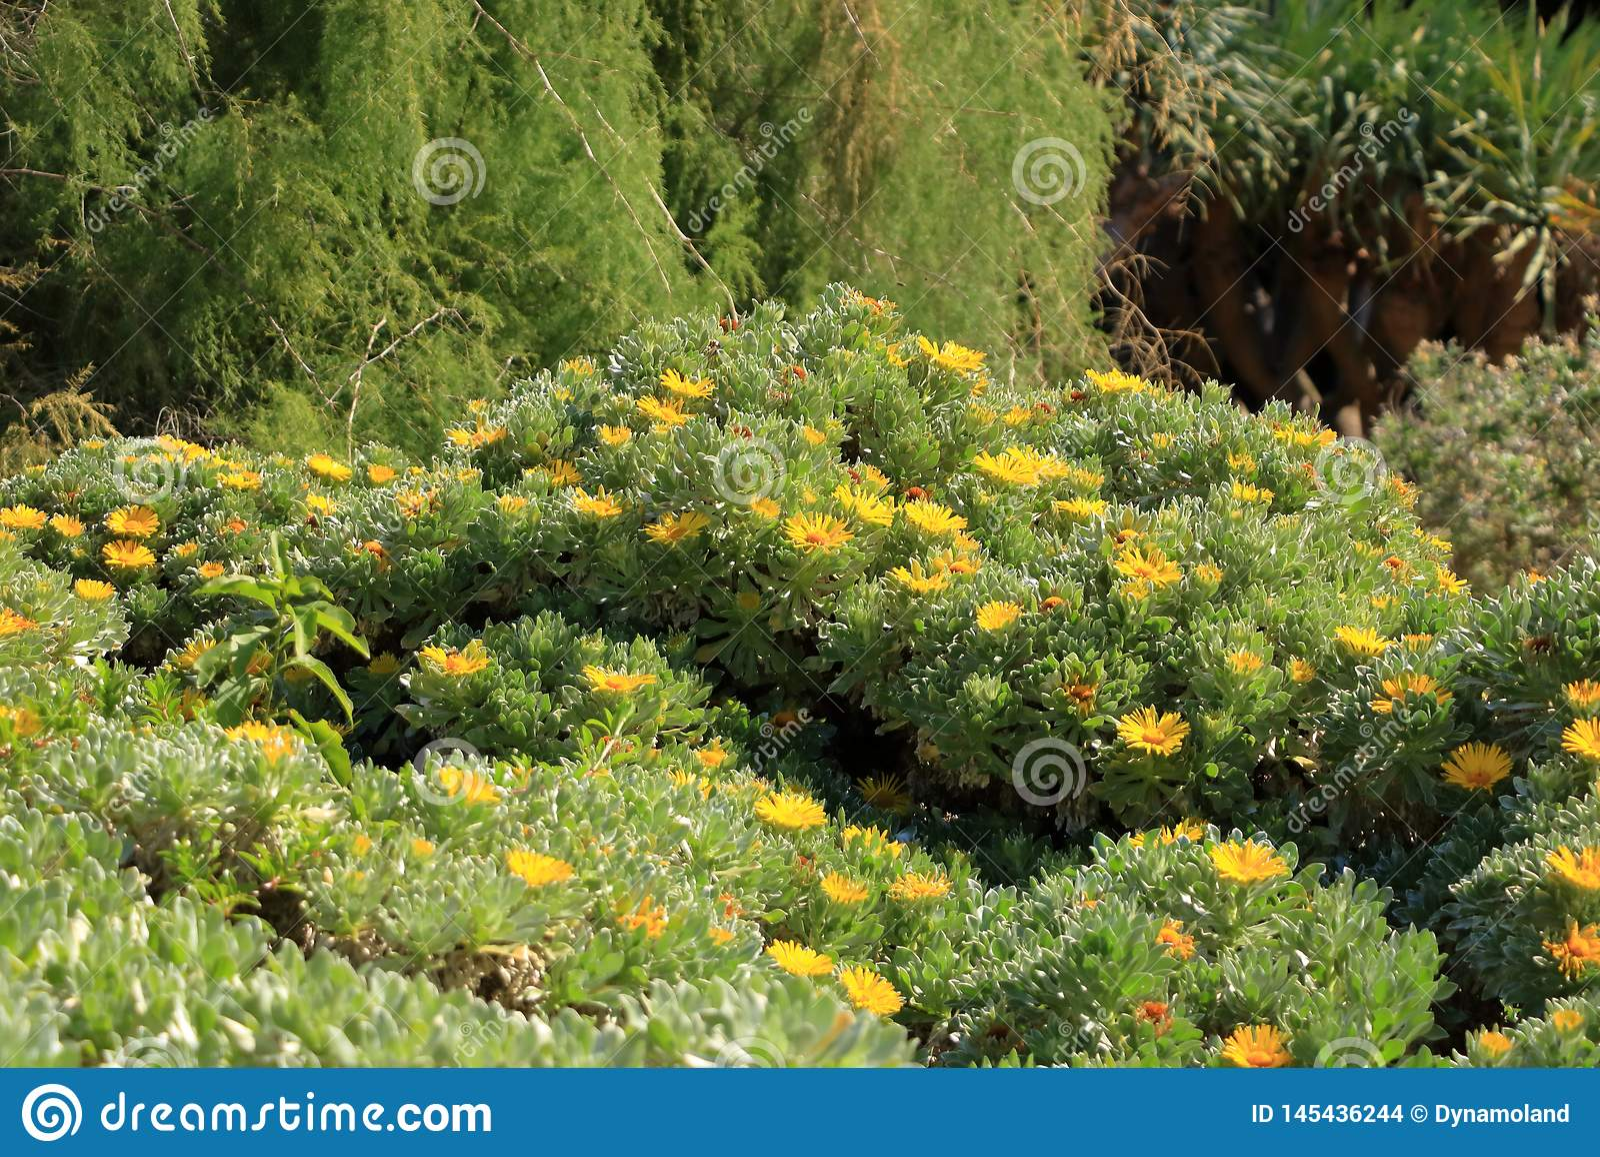 Flowering Asteriscus sericeus natural floral background